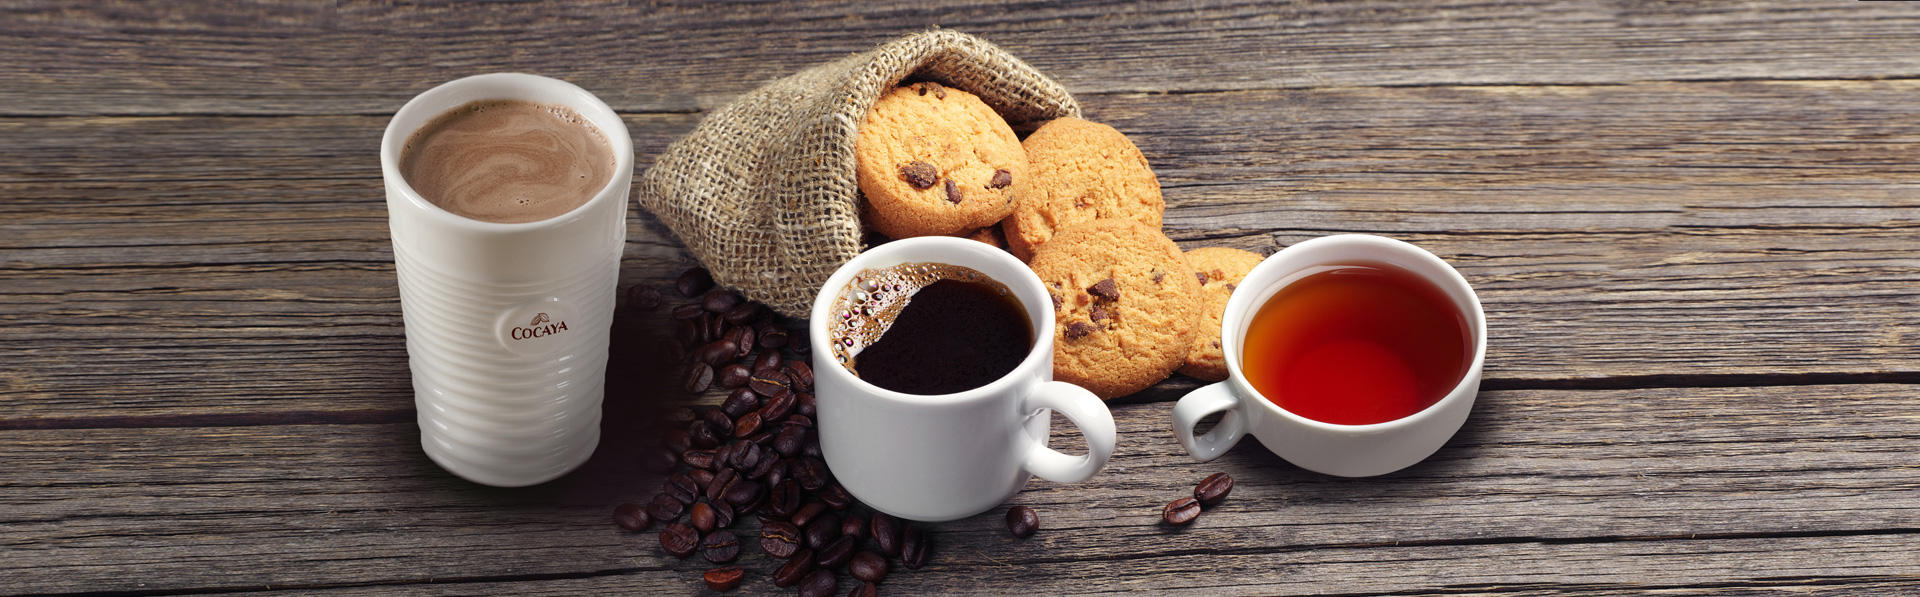 Kaffee,Tee,Kakao und Kekse